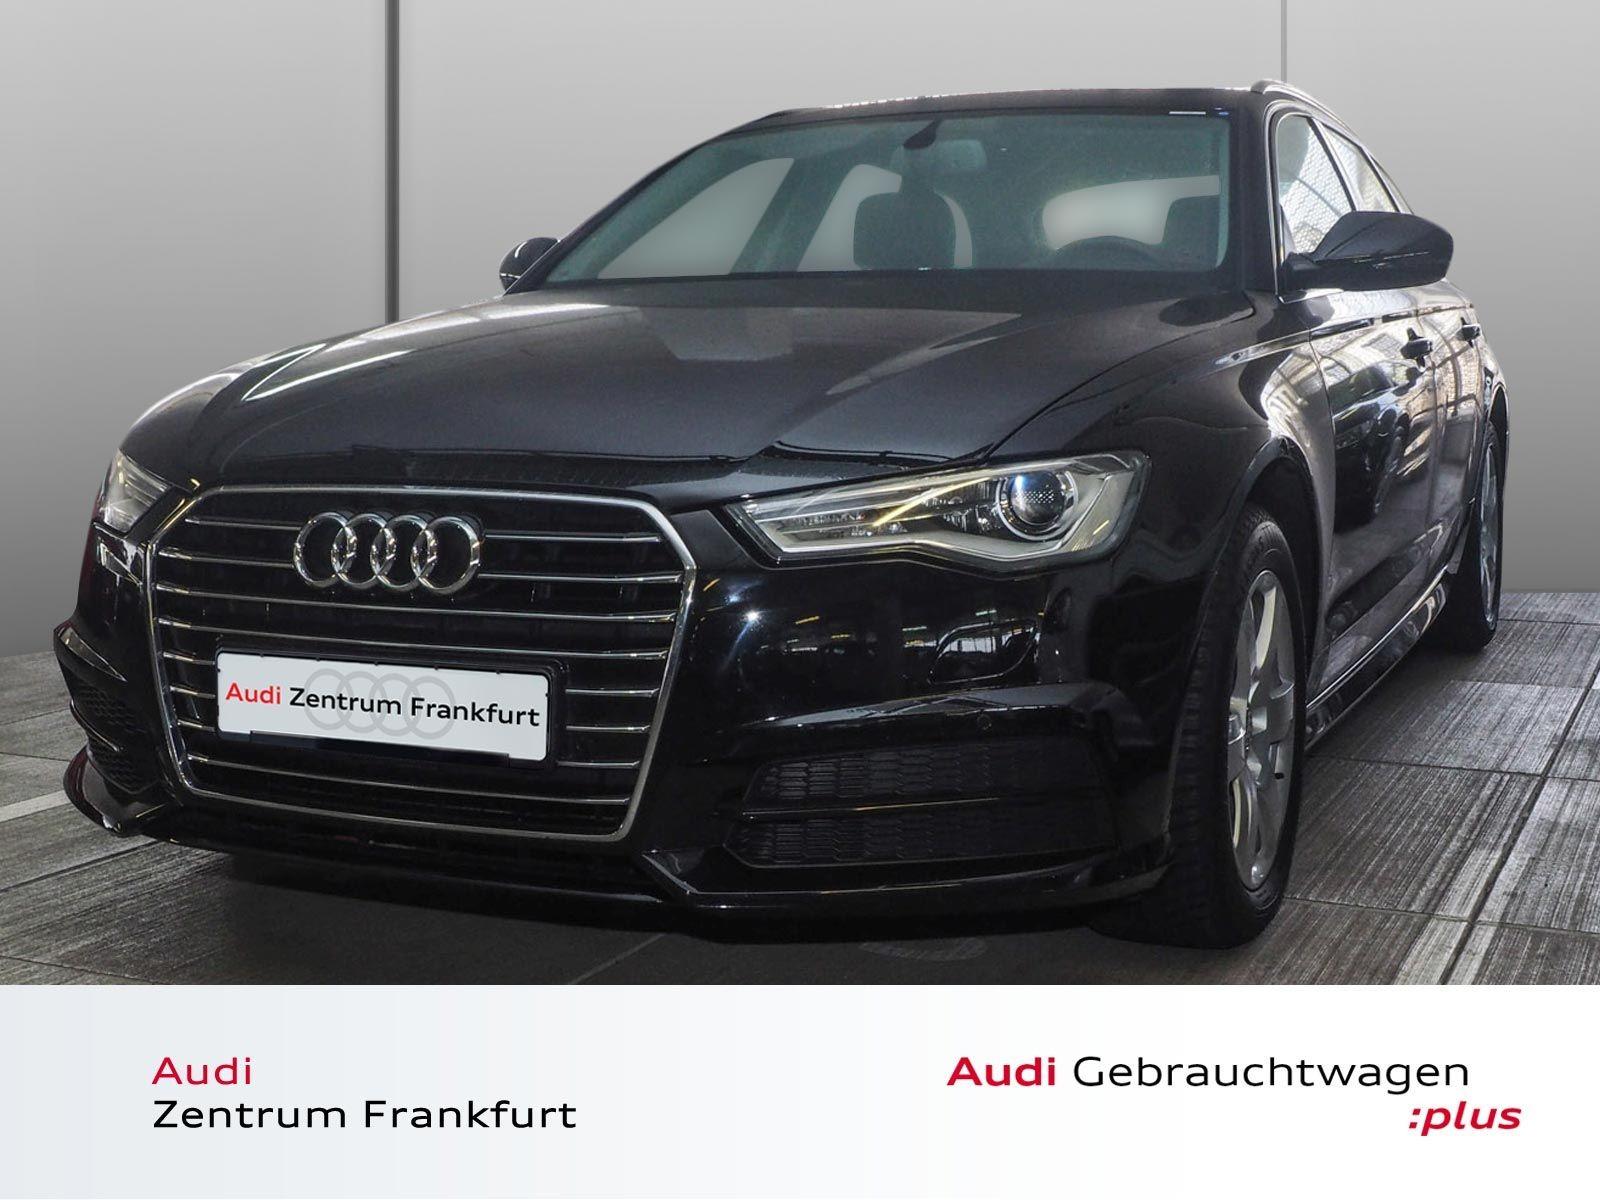 Audi A6 Avant 2.0 TDI ultra S tronic Xenon Navi Rückfahrkamera, Jahr 2017, Diesel